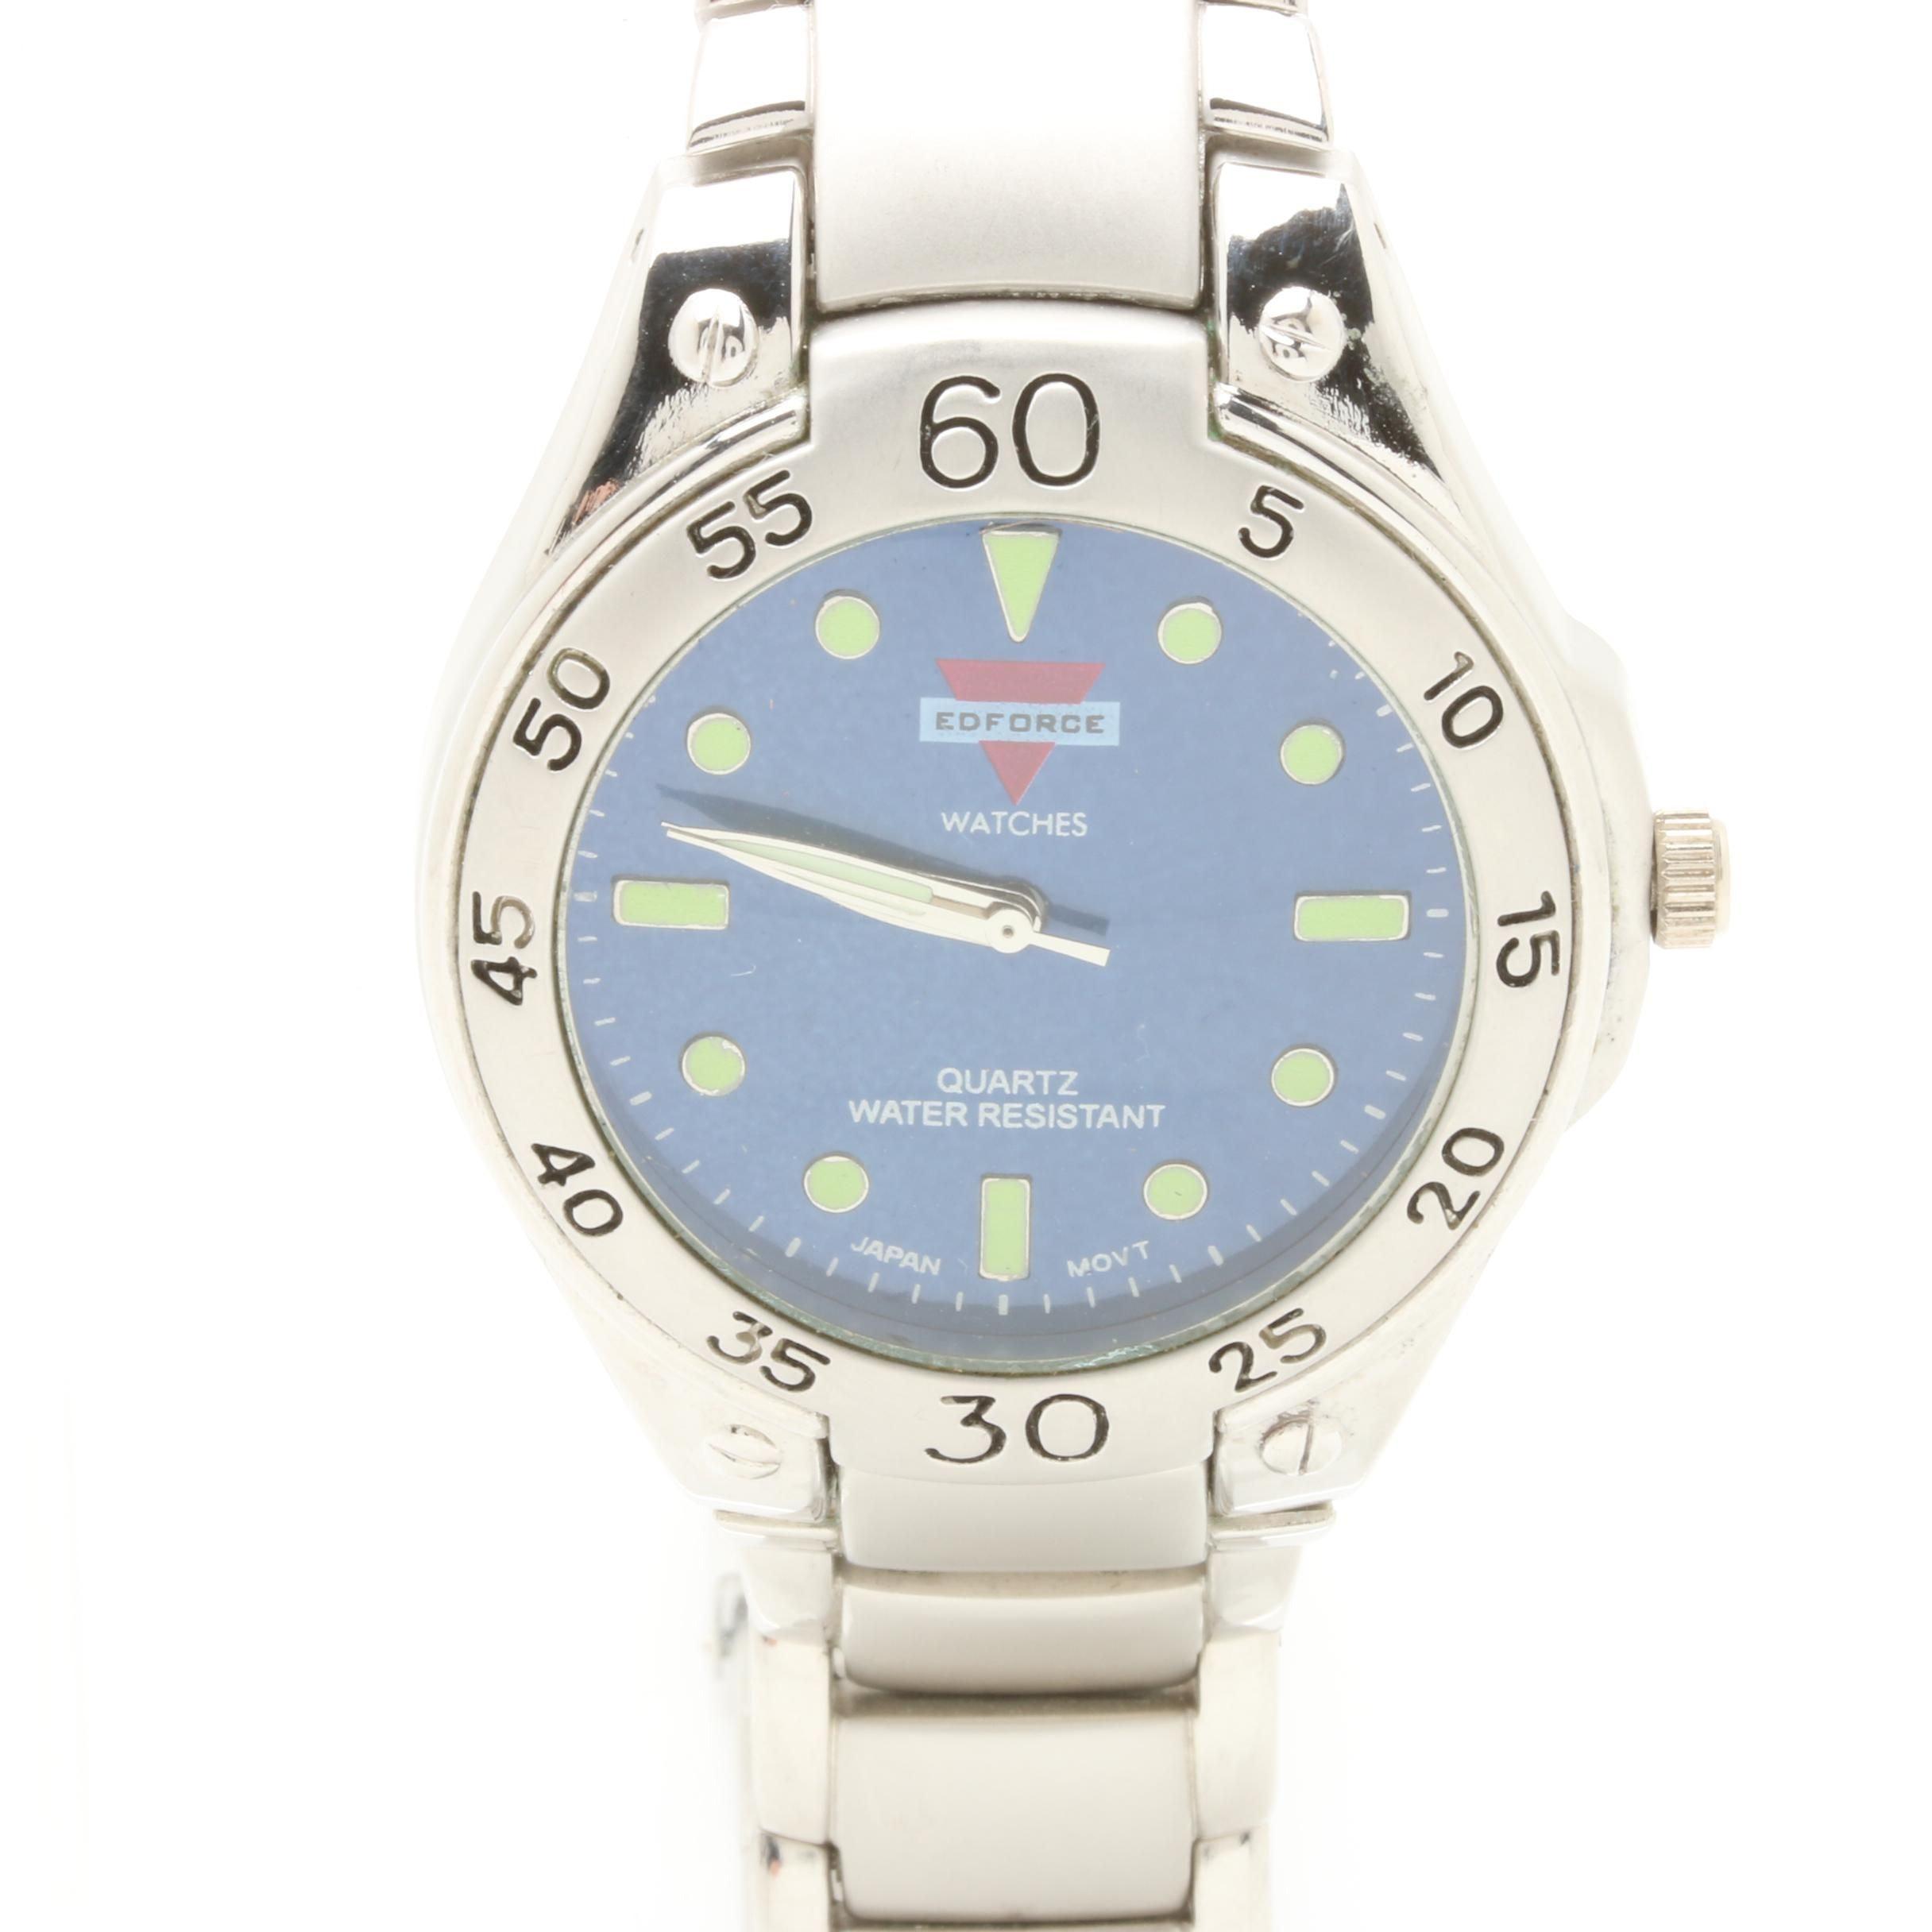 Edforce Silver Tone Wristwatch